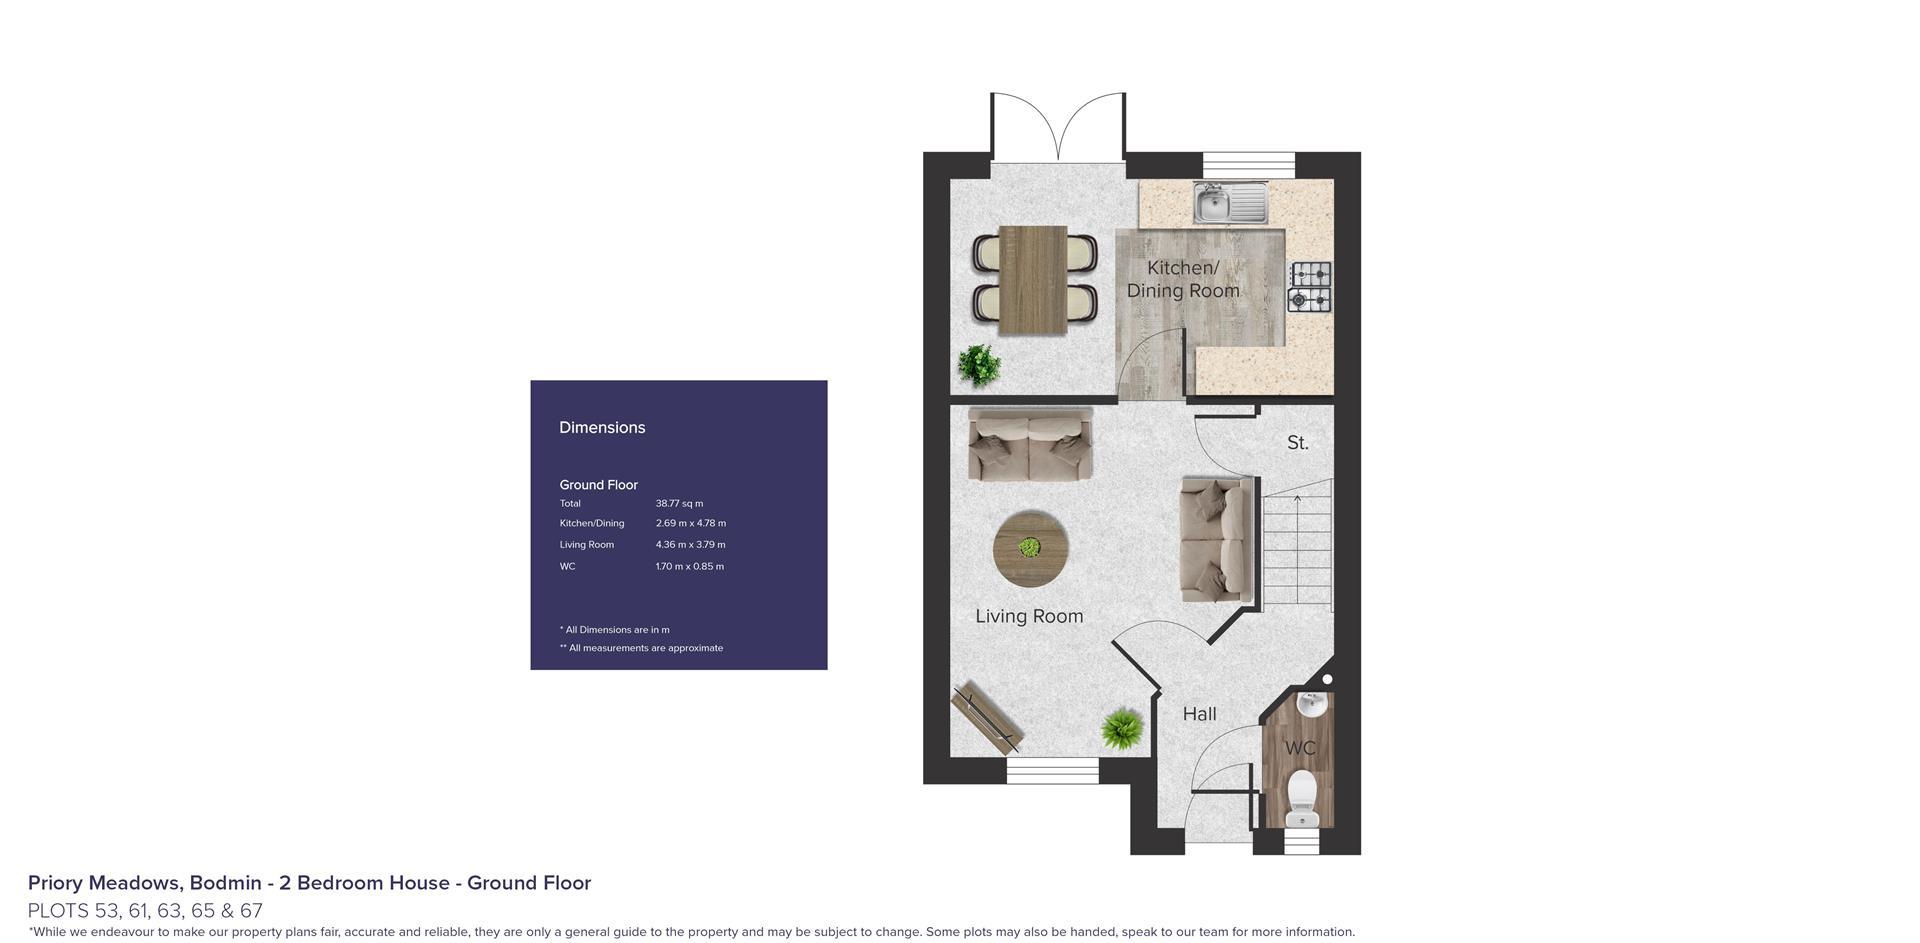 Priory Meadows, Bodmin_Plots 53, 61, 63, 65 & 67_G